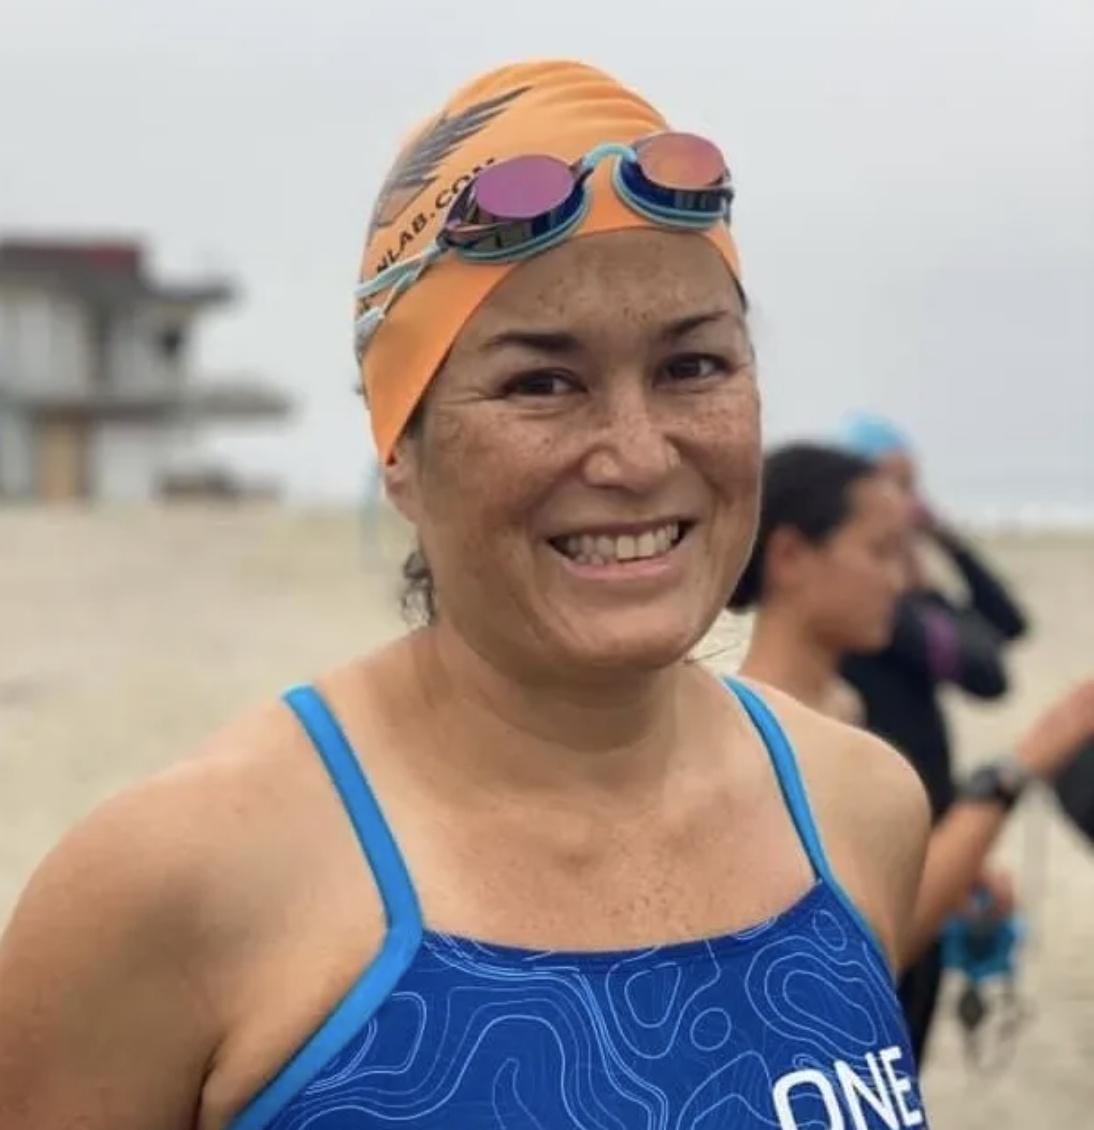 Guam Olympian Barbara Gayle reflects on journey